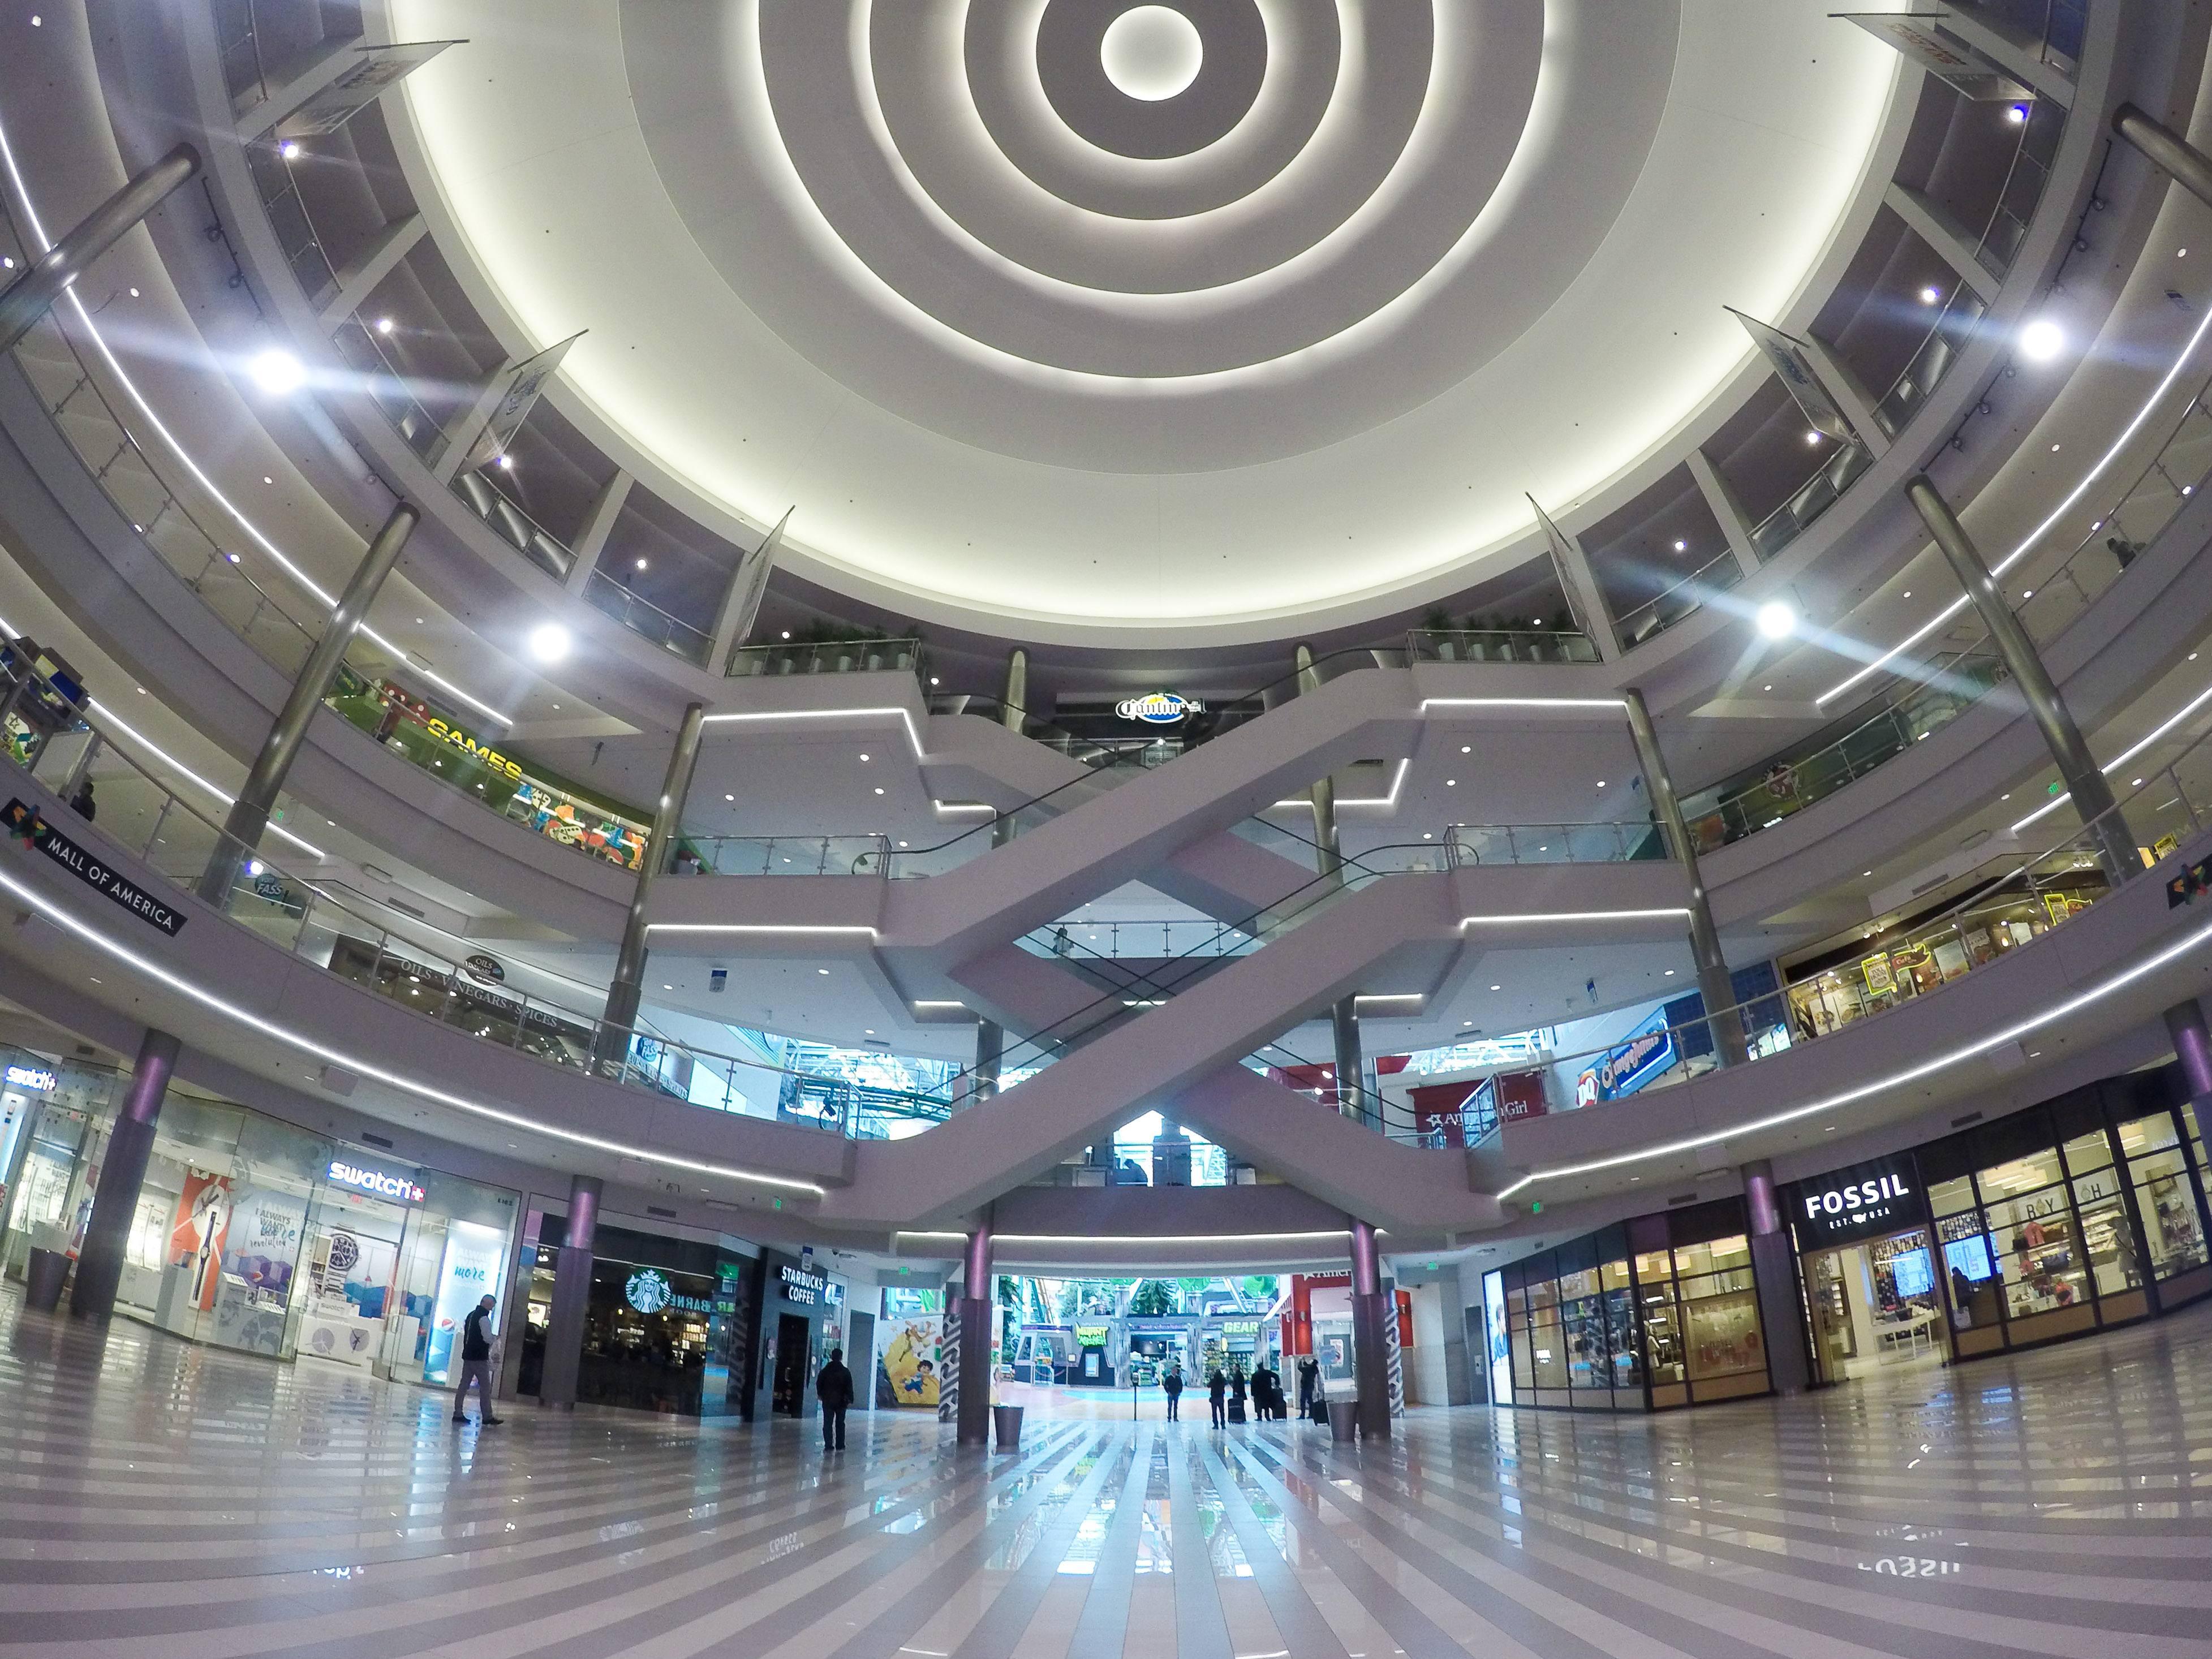 Mall of America rotunda